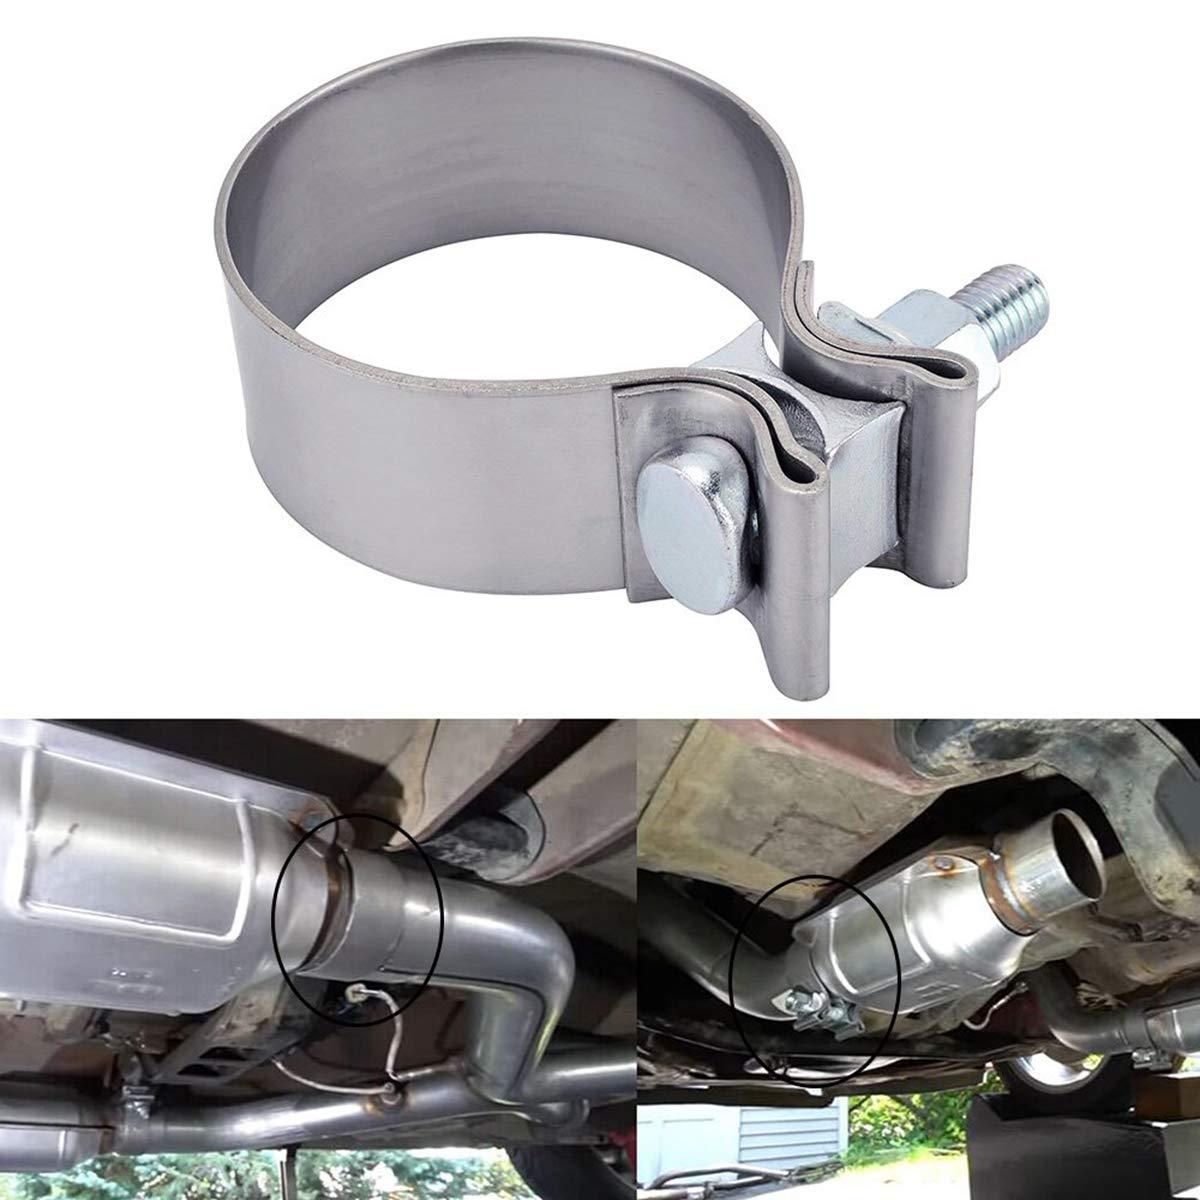 Exhaust Pipe Clamp Muffler Repair Parts Exhaust Flex Pipe Exhaust Manifold Exhaust Resonator 3.0 Exhaust Clamp Stainless Steel Band Clamp for Exhaust Tips Catalytic Converter Repair Program